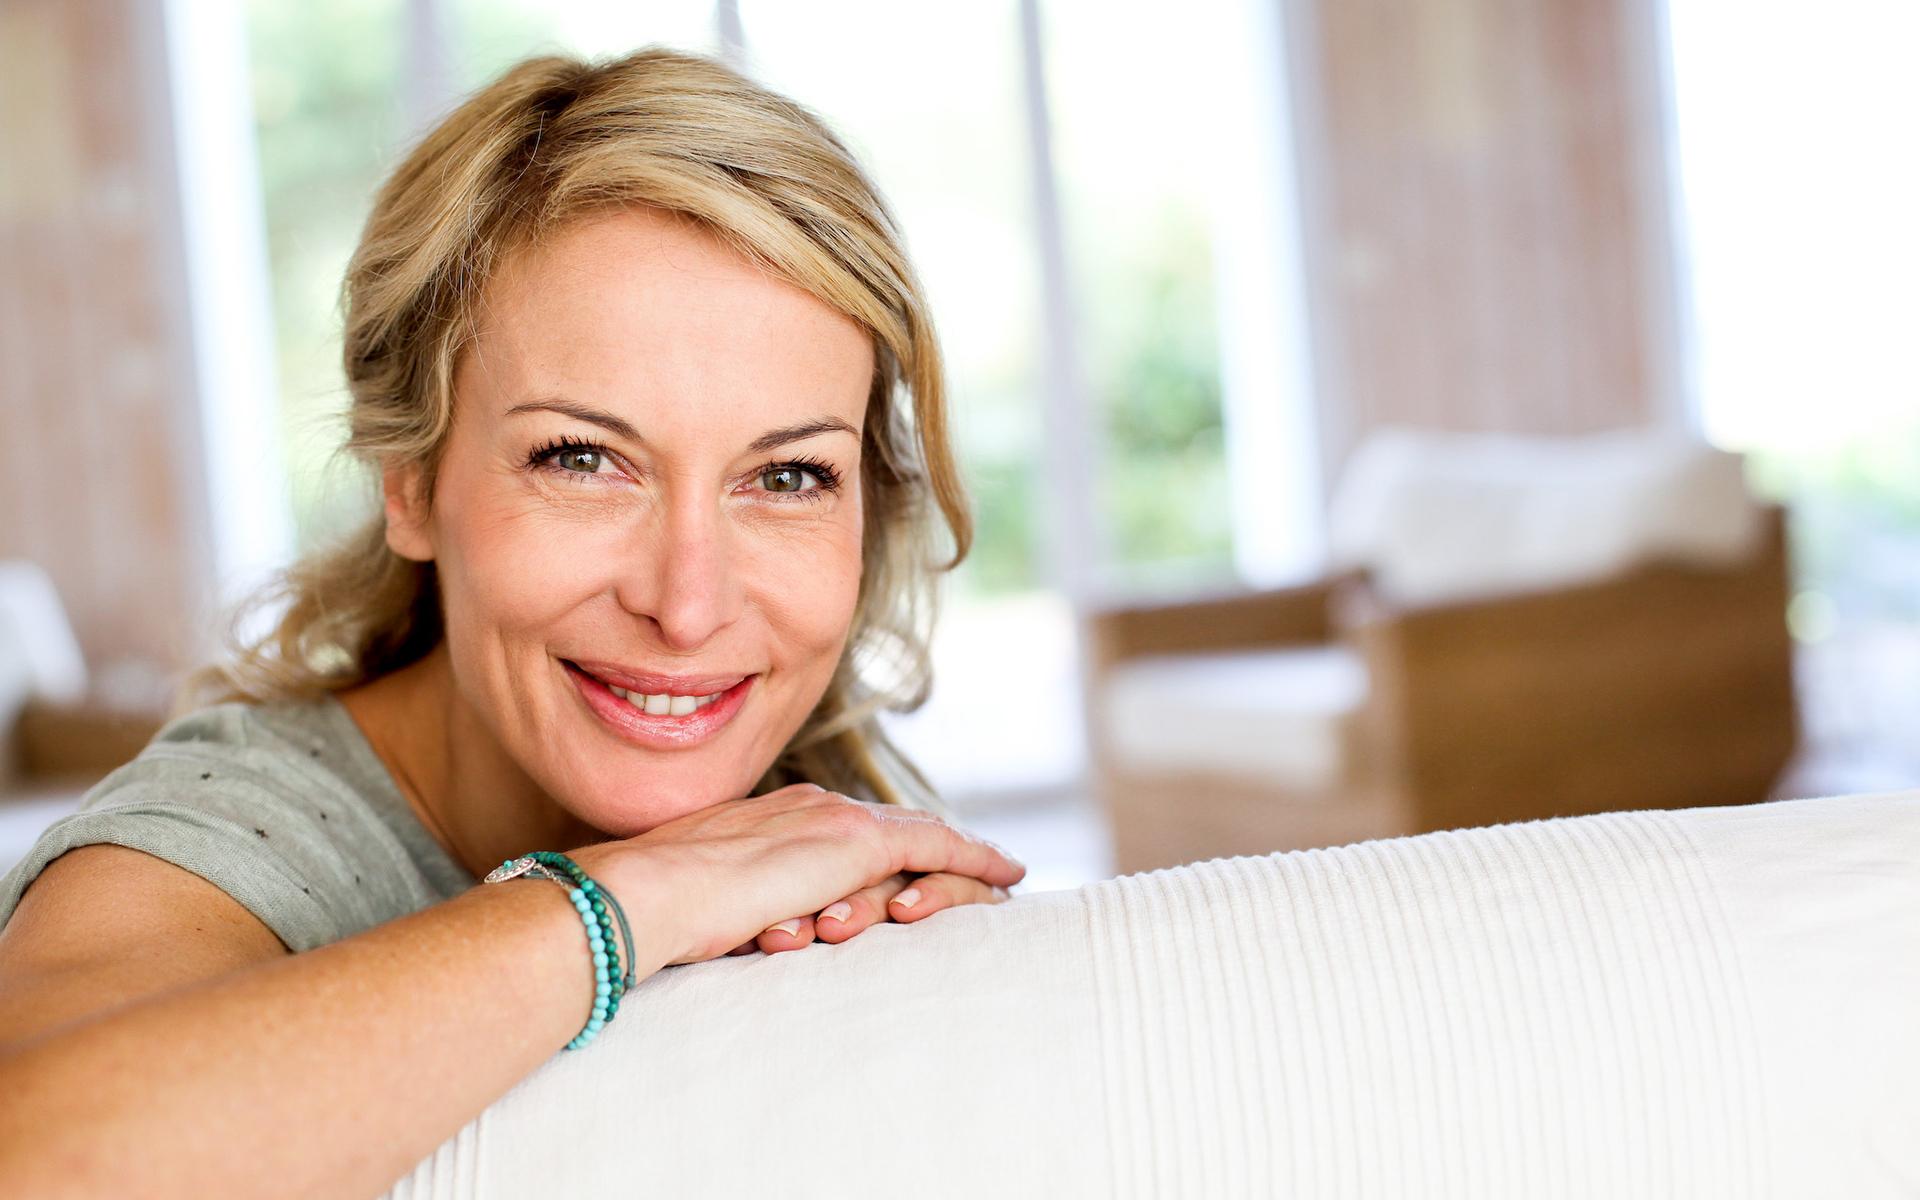 Vitex , capsule (Tulburari premenstruale si menopauza) - keracalita-jaristea.ro